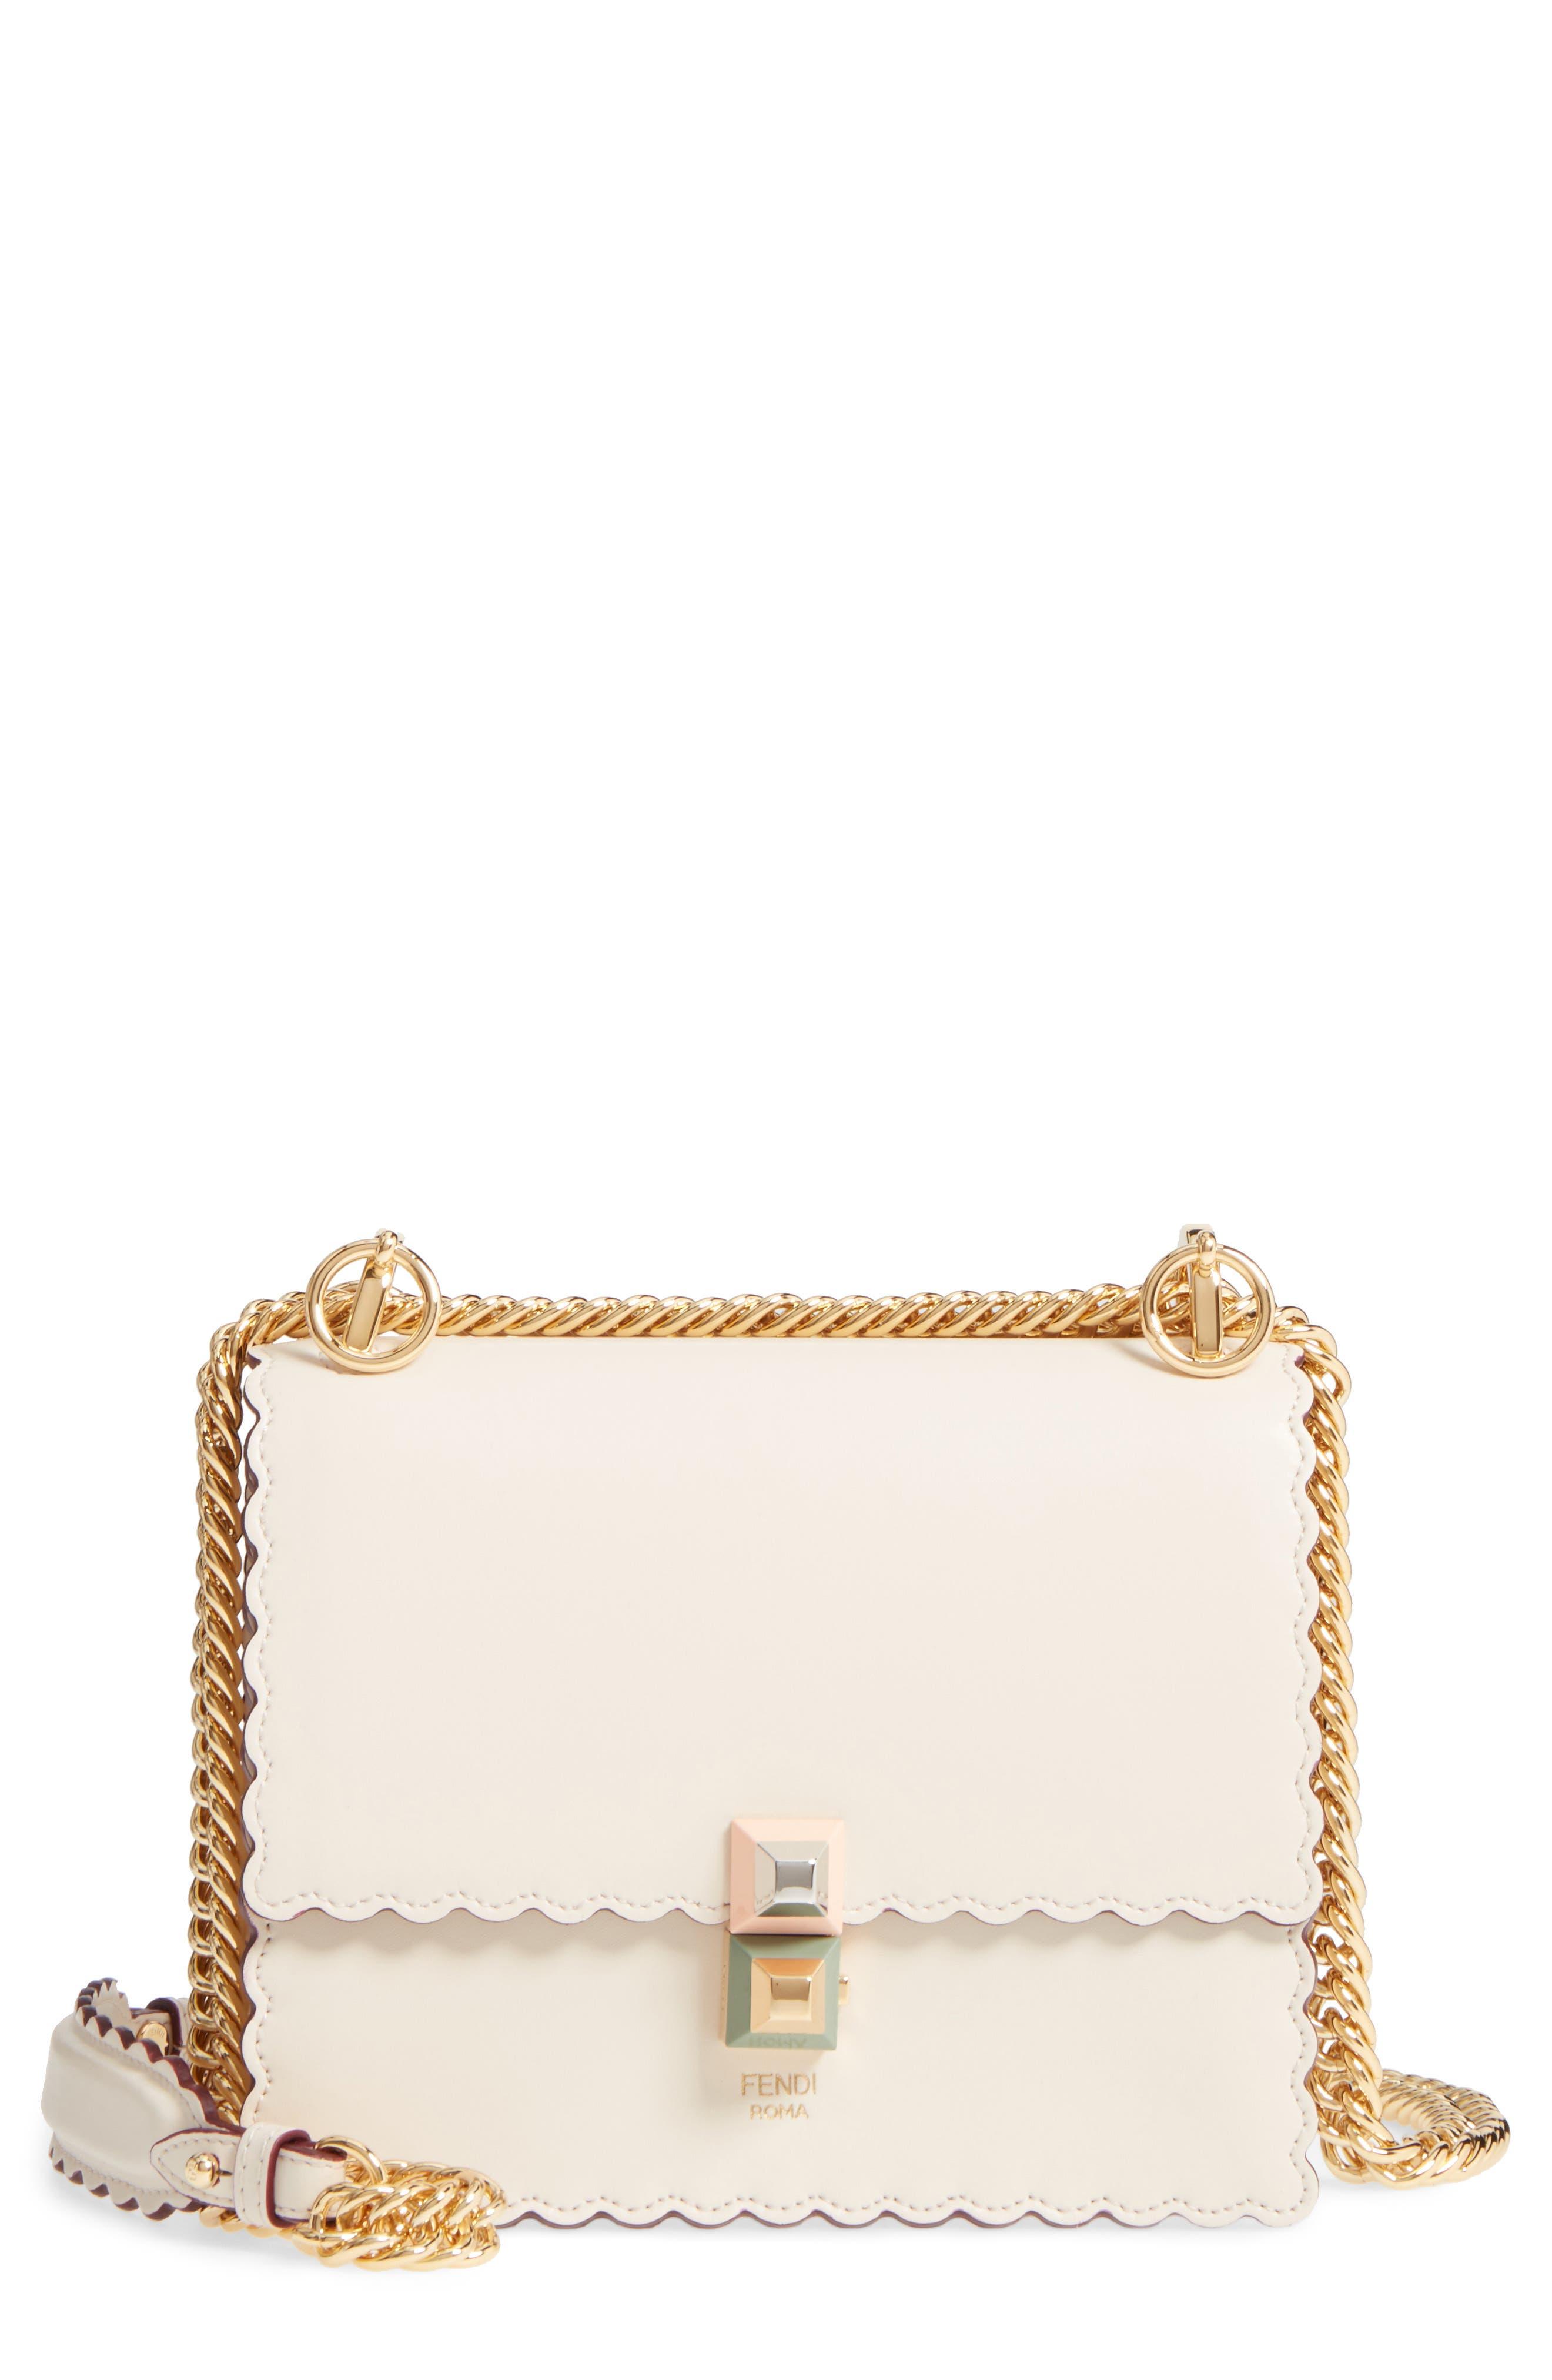 Alternate Image 1 Selected - Fendi Mini Kan I Scalloped Leather Shoulder Bag